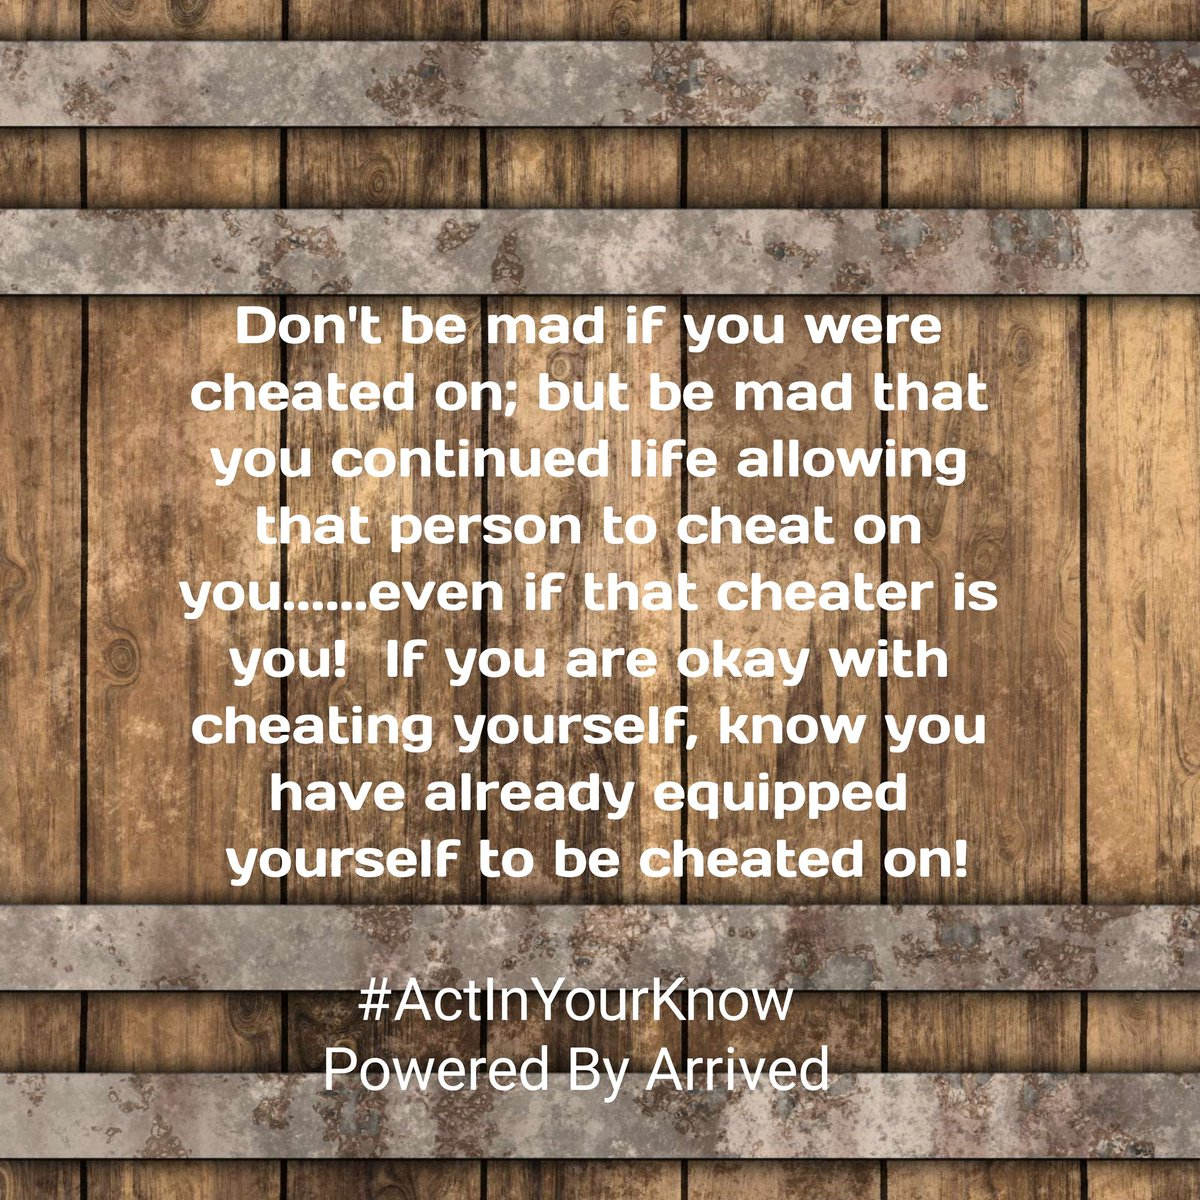 #ActInYourKnow POWERED BY ARRIVED #knowledgeofself #knowledge #selflove #knowyourhistory #knowyourtone #knowyourworth #wisdom #knowledgeispower #knowthedifference #knowyourrights #knowyourstatus #knowthyself #truth #consciousness #knowbetterdobetter #knowhow #lifestyle #lifetipspic.twitter.com/CMPXexDZwI